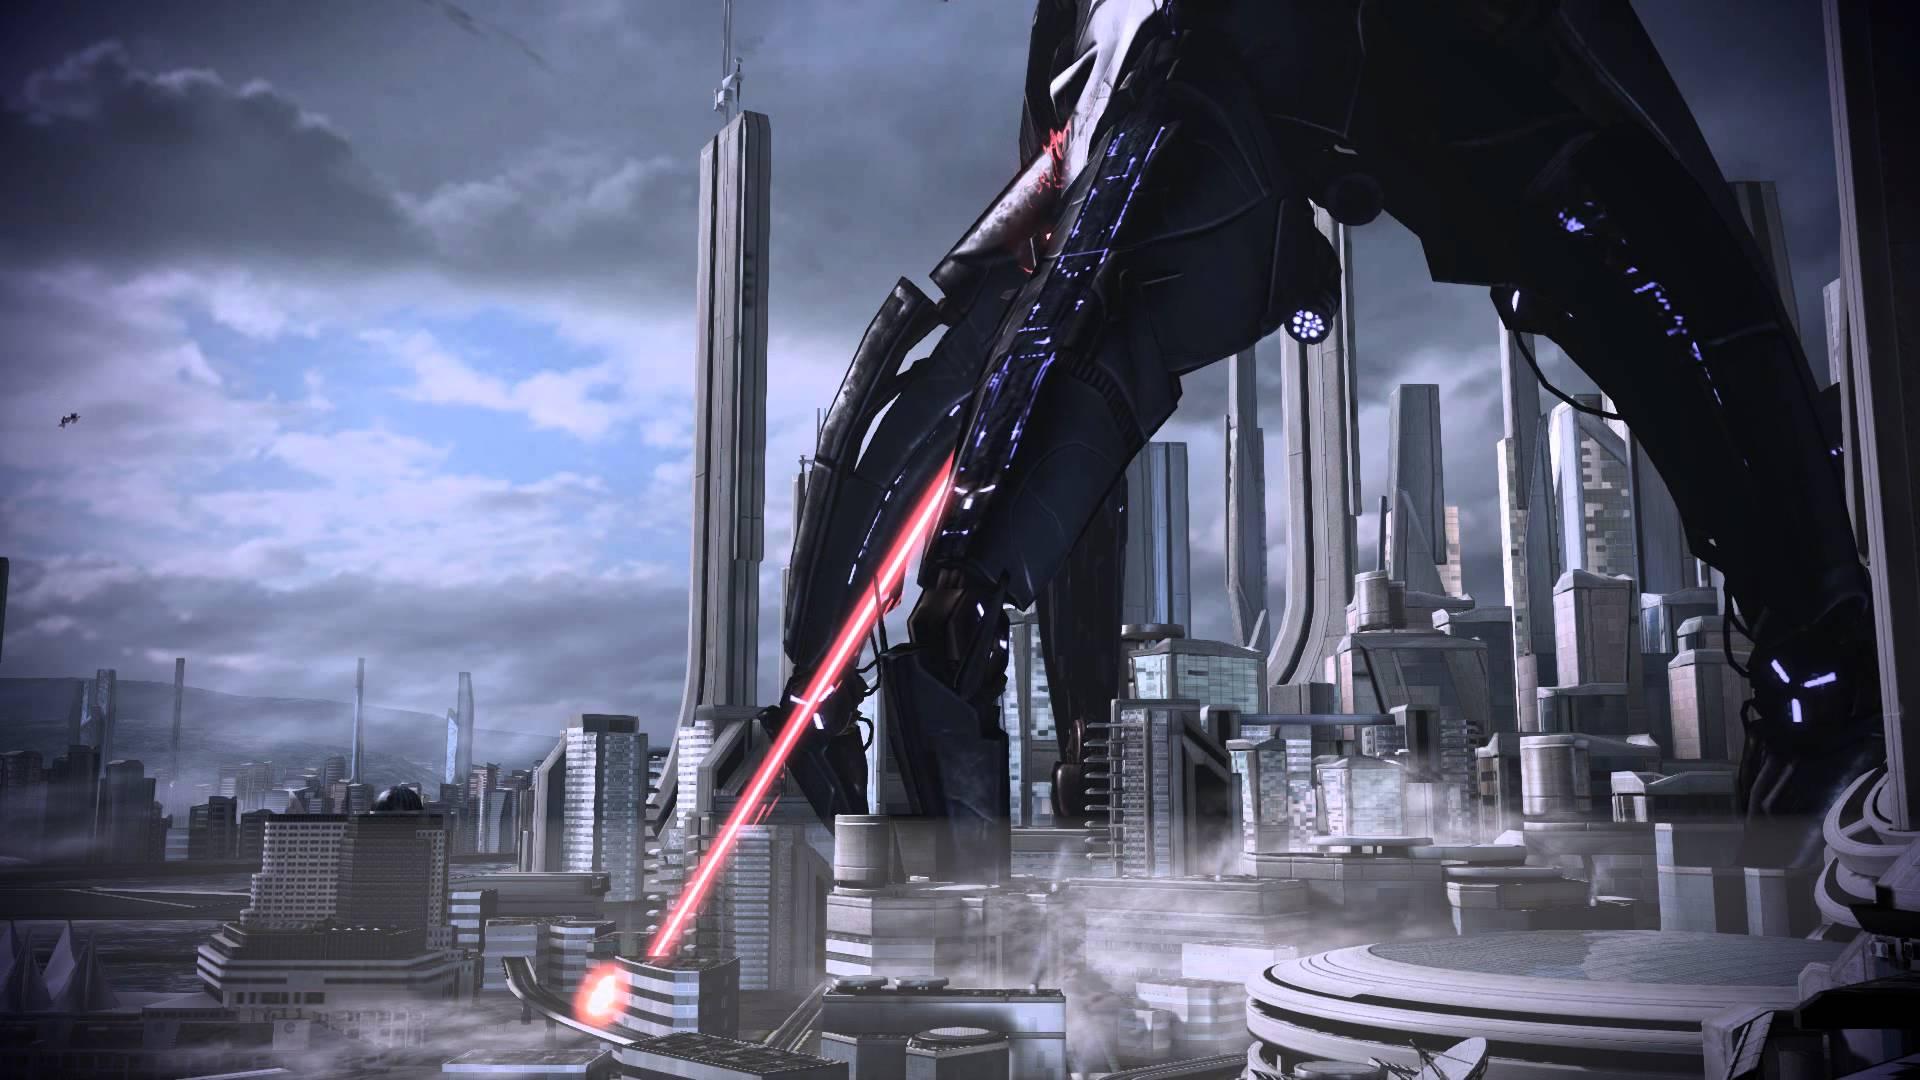 Mass Effect 3 Earth Vancouver Reaper Dreamscene Video Wallpaper